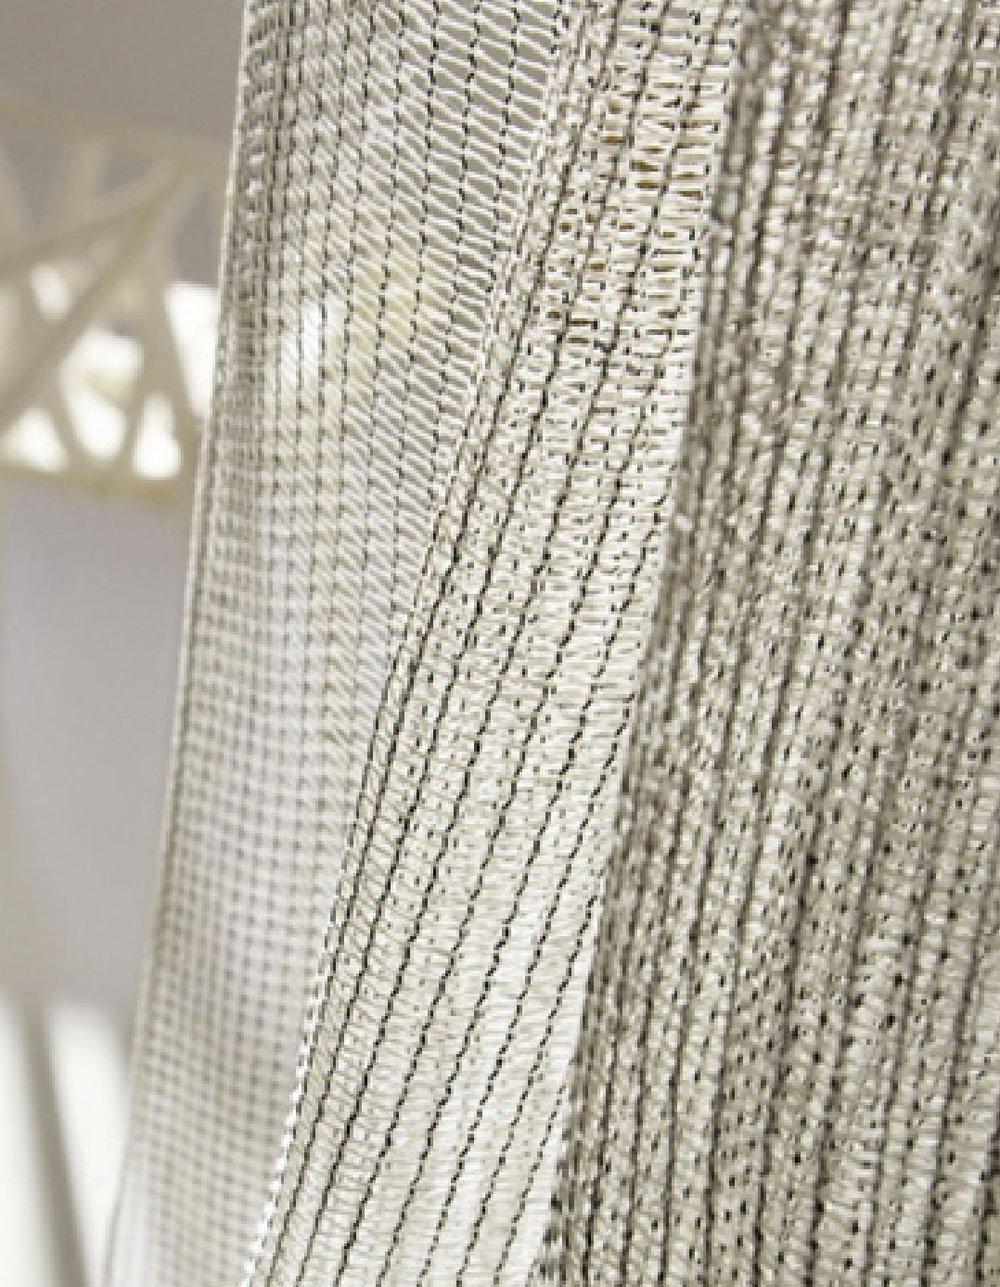 03. WOHNTEX , mesh fabric for curtains